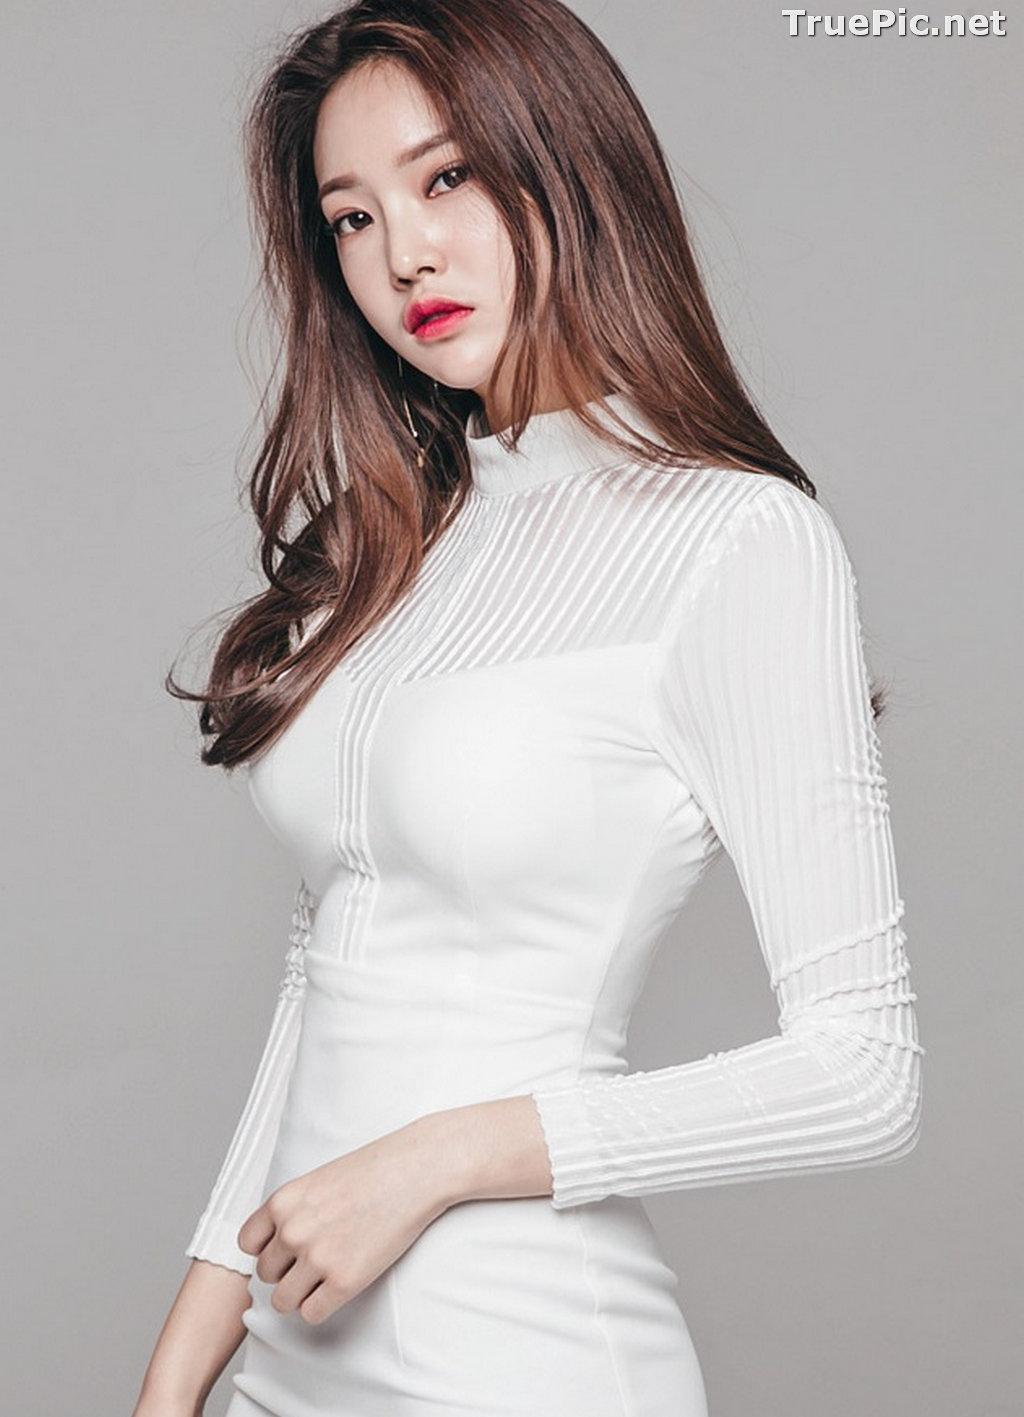 Image Korean Beautiful Model – Park Jung Yoon – Fashion Photography #11 - TruePic.net - Picture-48